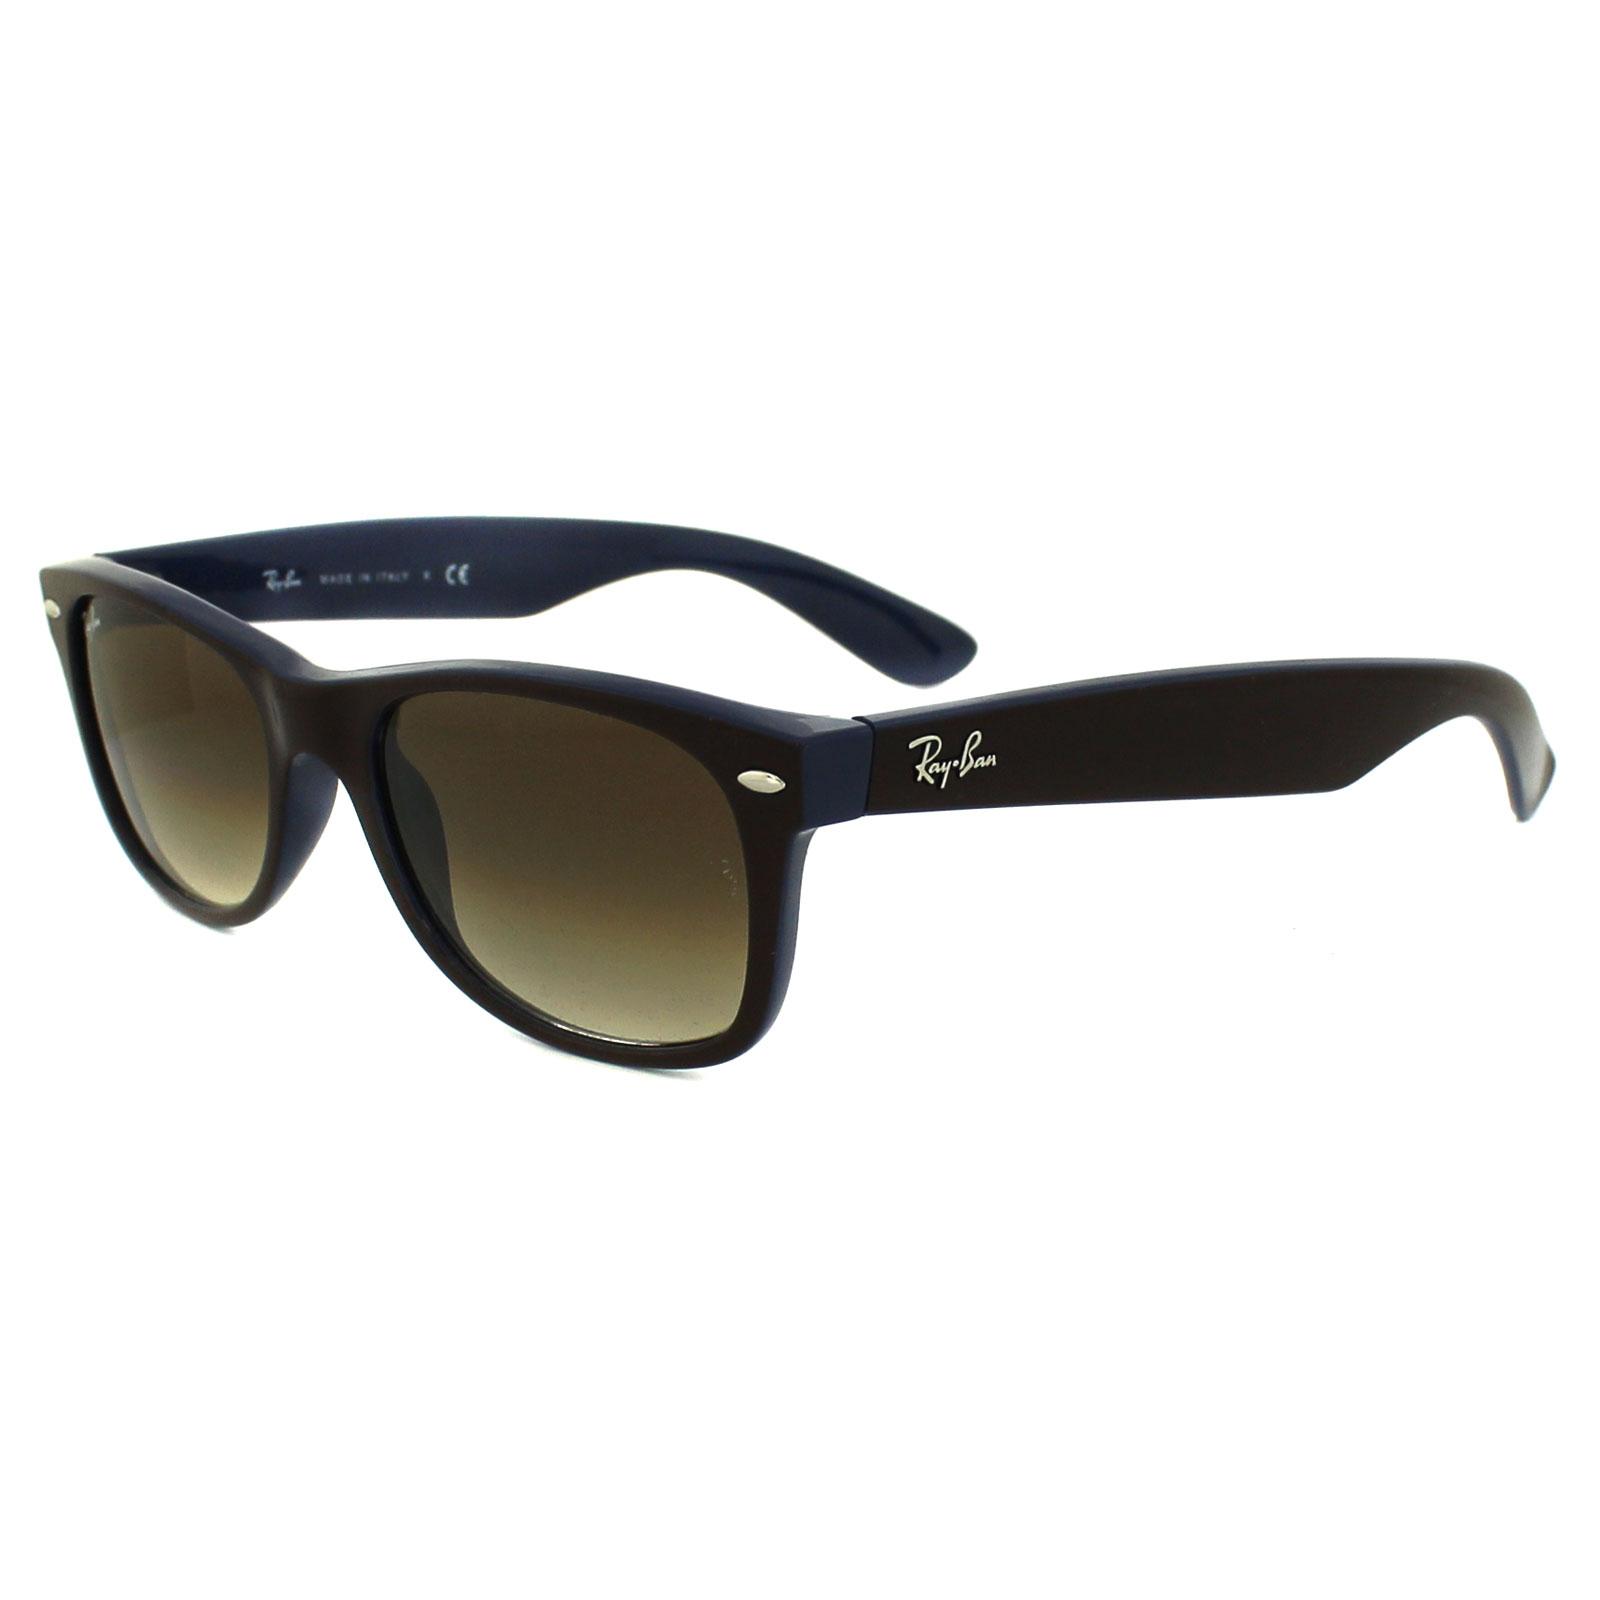 264f008d4d549 Sentinel Ray-Ban Sunglasses New Wayfarer 2132 874 51 Top Brown Blue Light  Brown Gradient